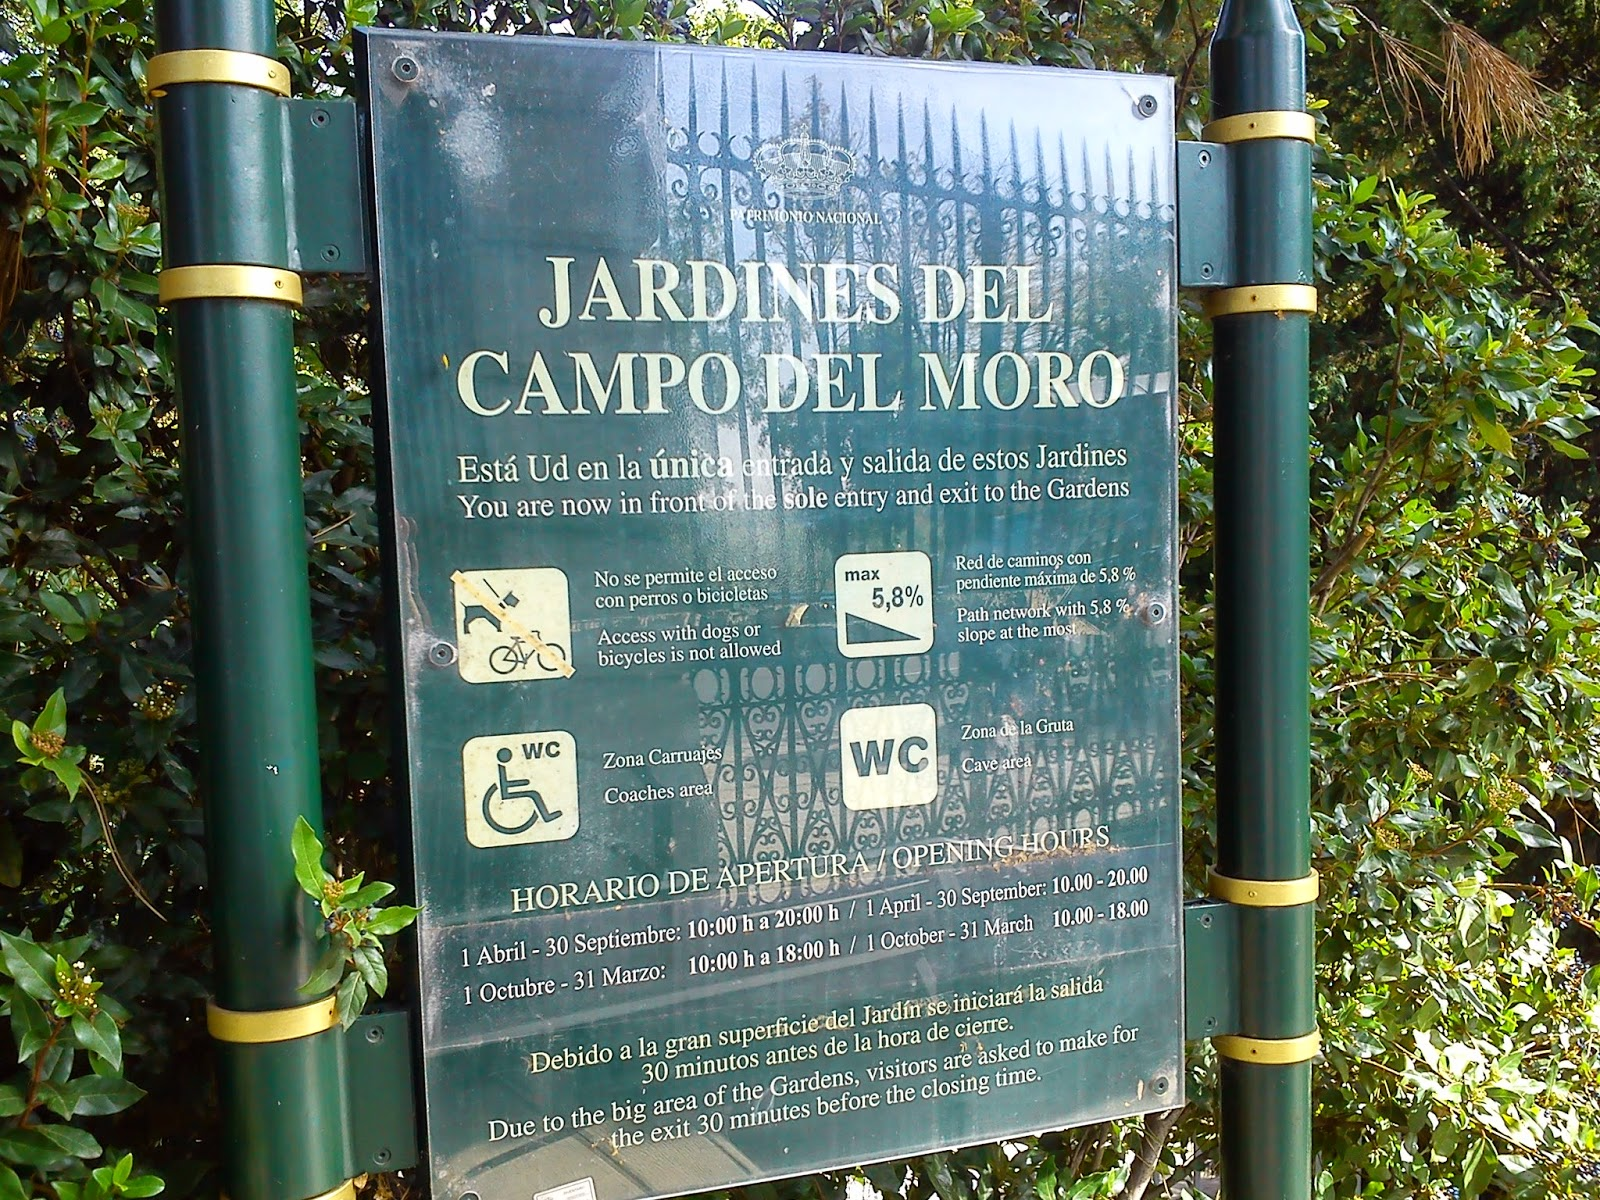 Por la calle de alcal jardines del campo del moro madrid for Jardines del moro